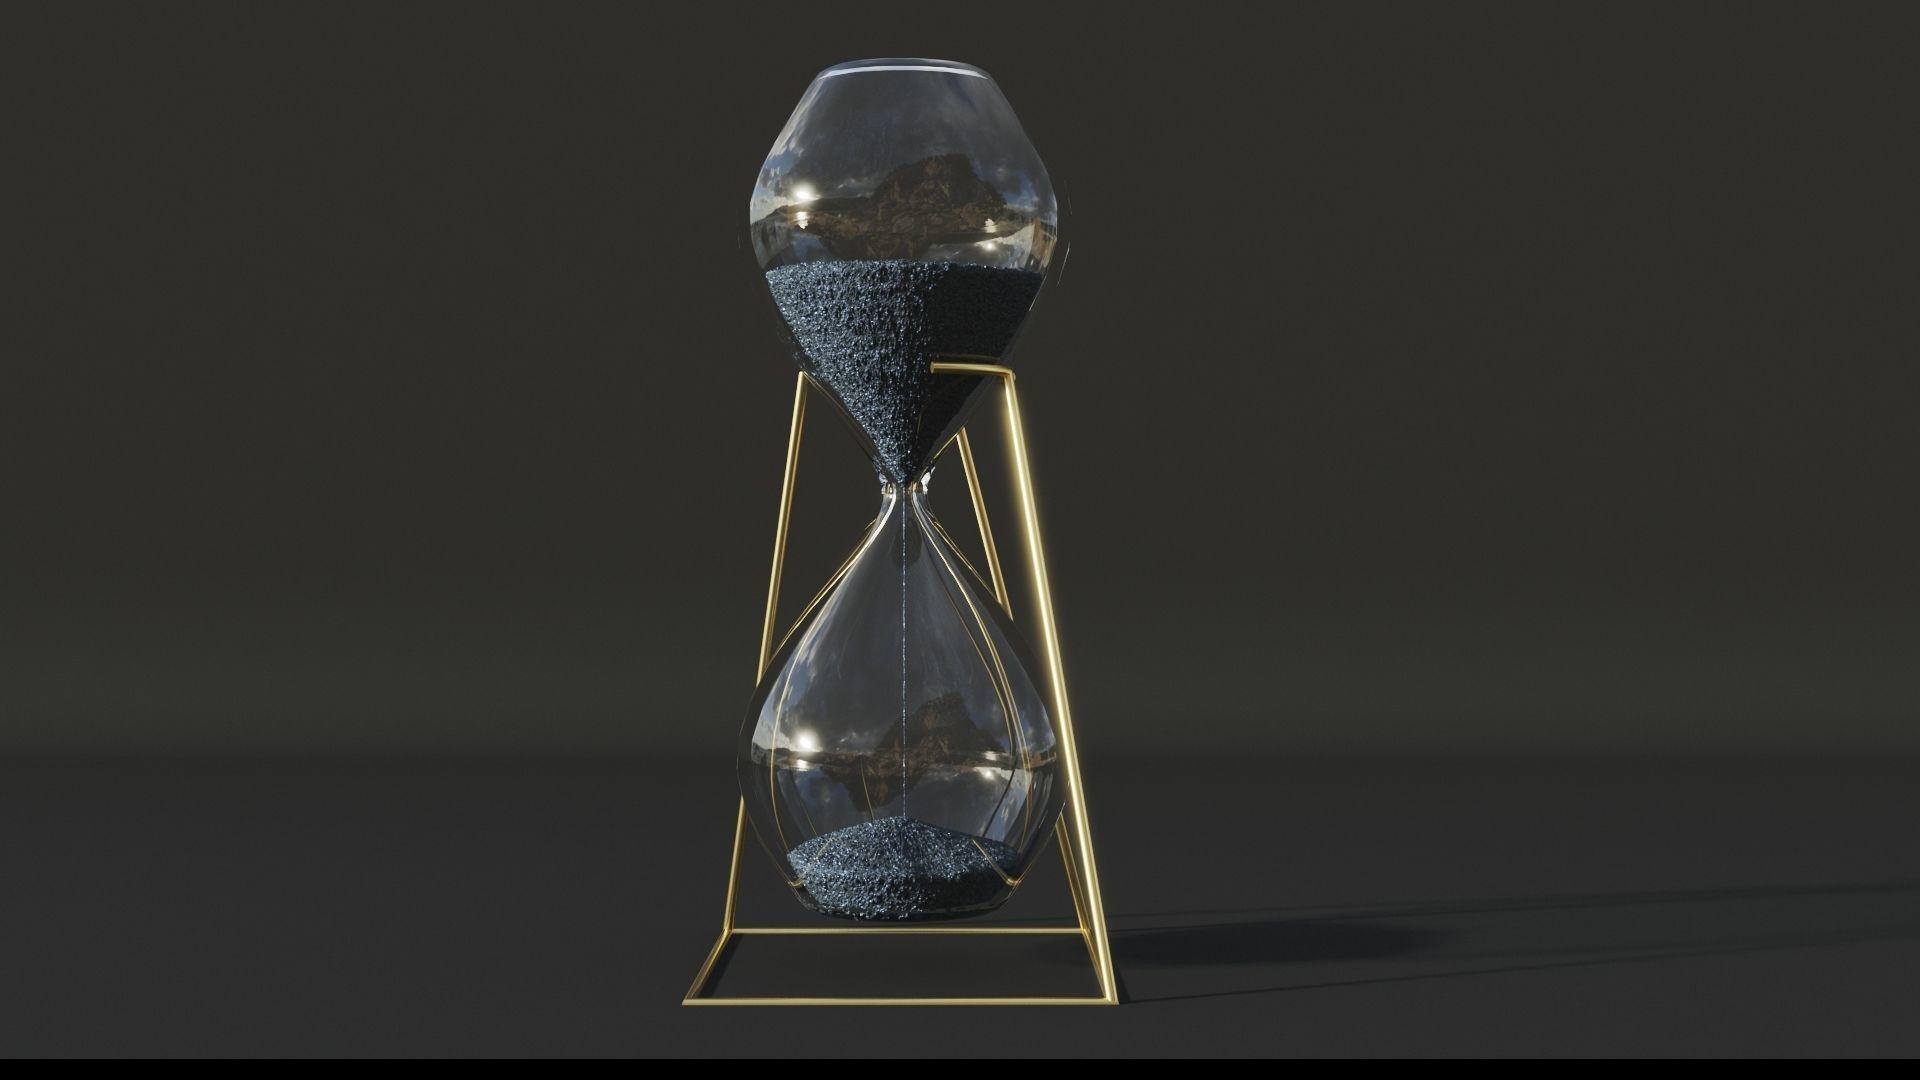 Hourglass Lowpoly